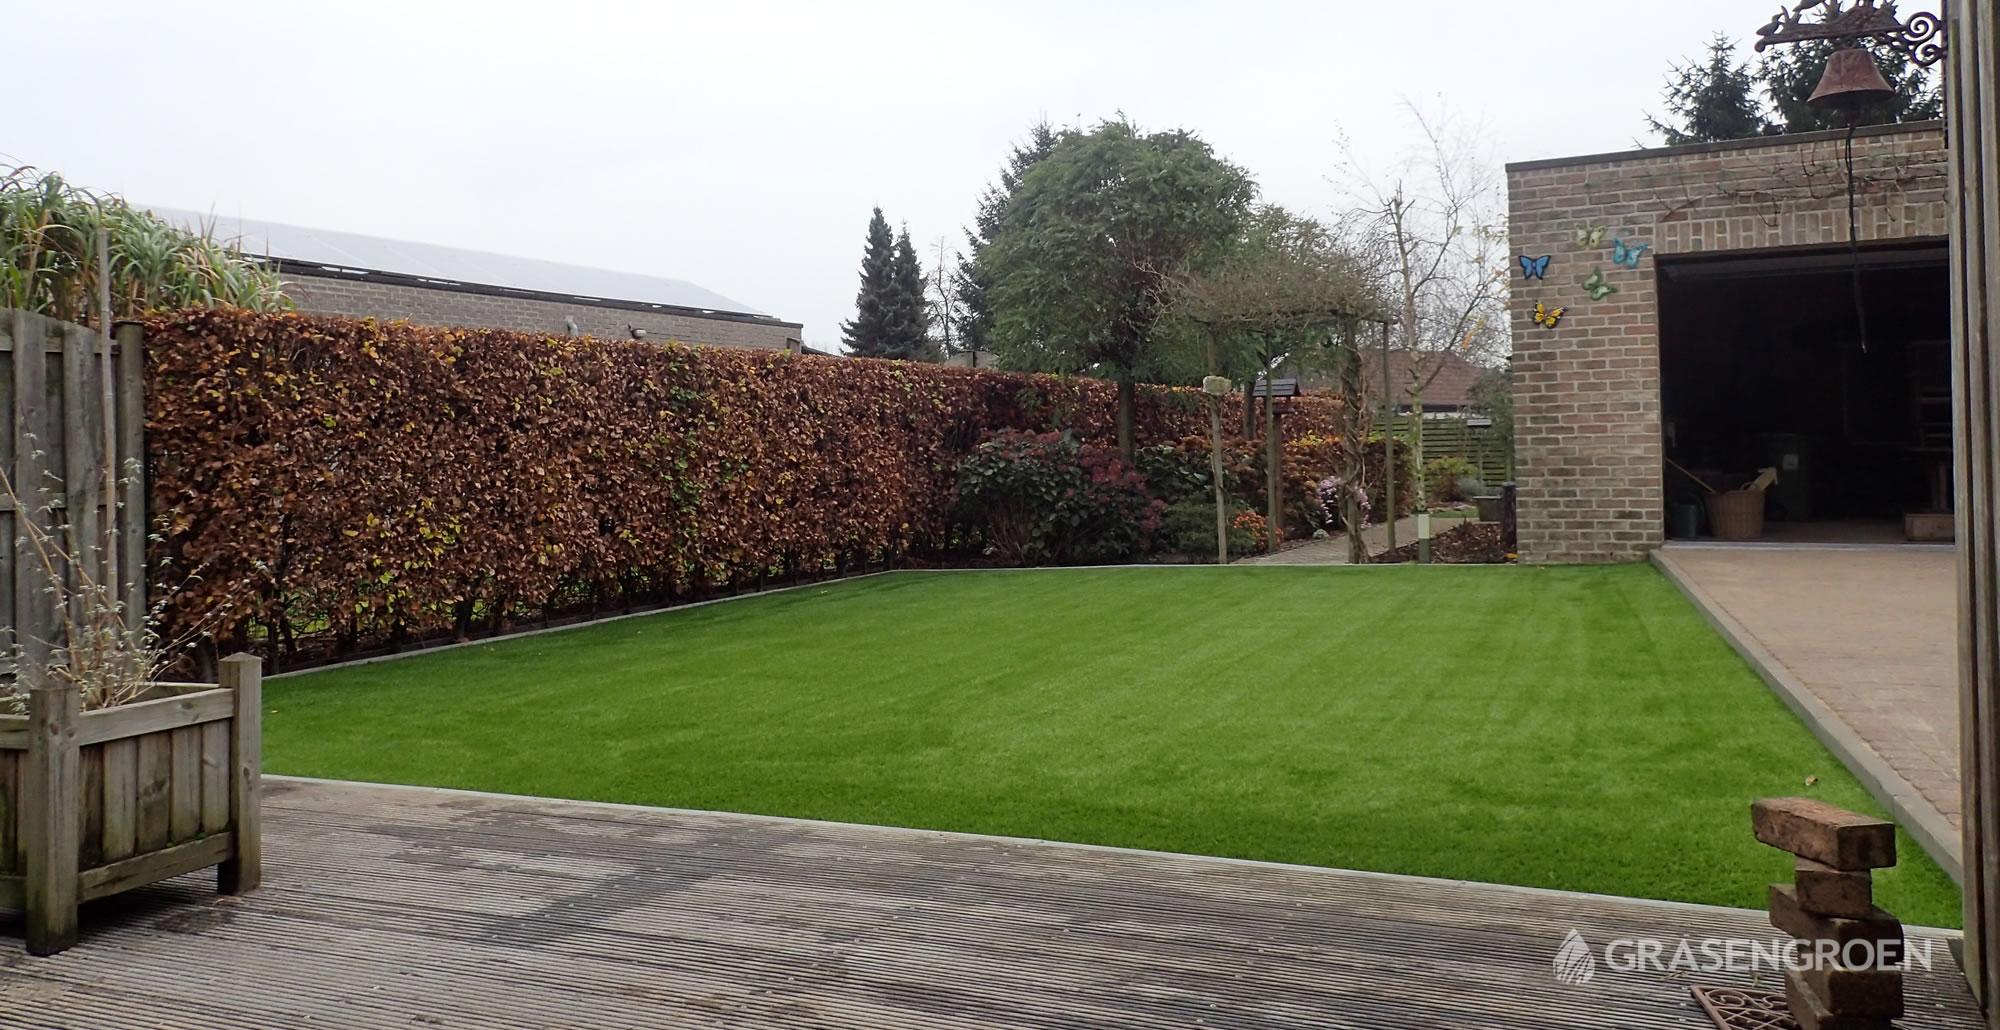 Kunstgrasleggennijlen18 • Gras en Groen Kunstgras